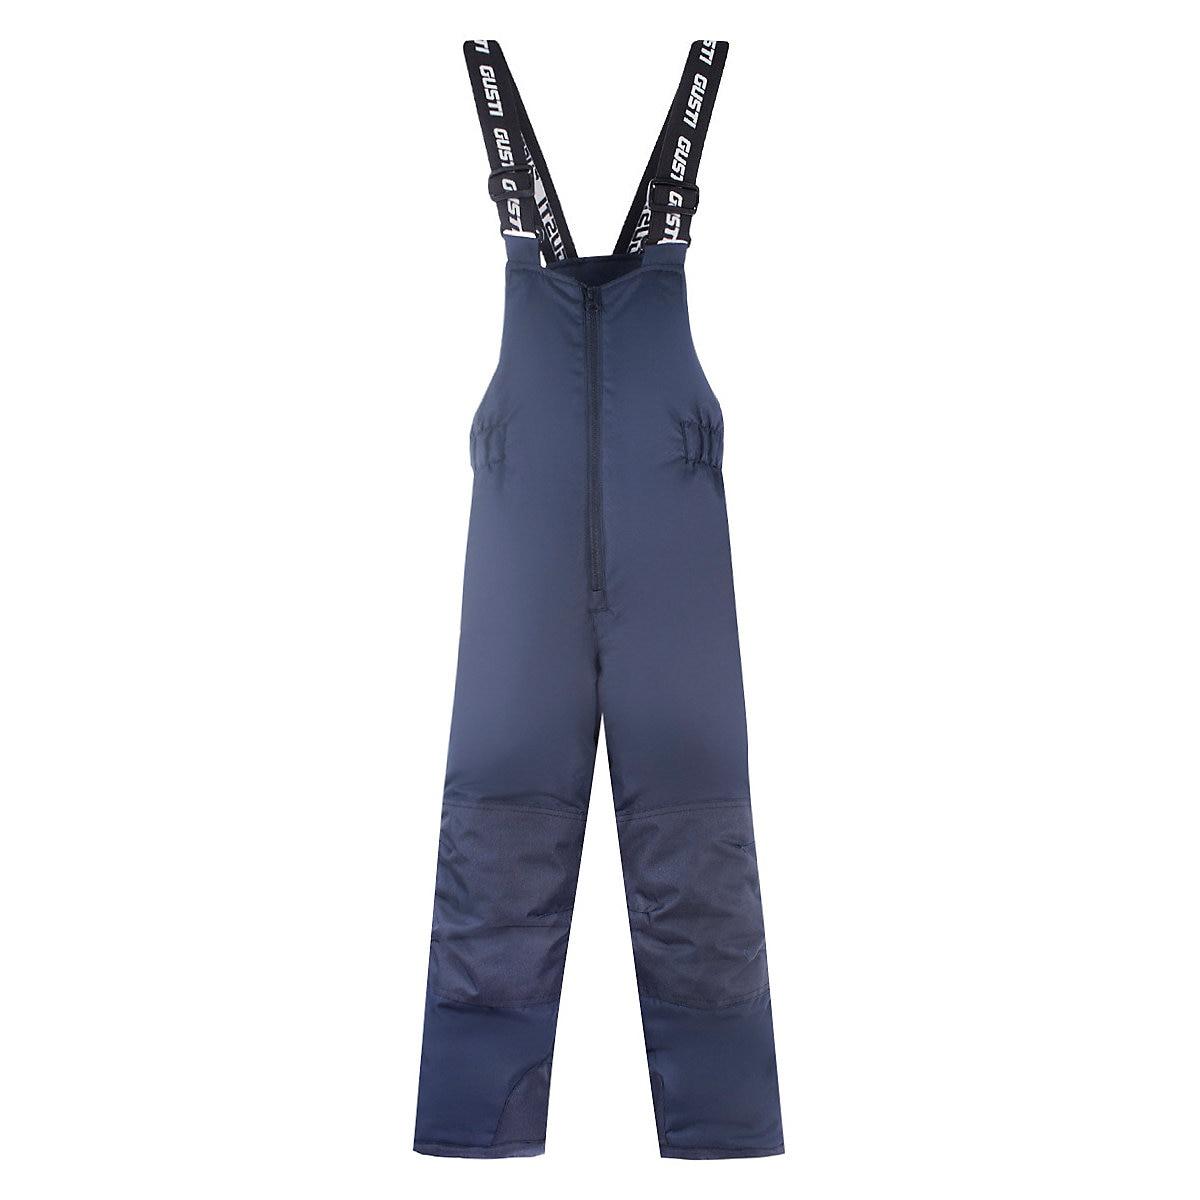 GUSTI Pants & Capris 9511938 clothes for boys boy children clothing